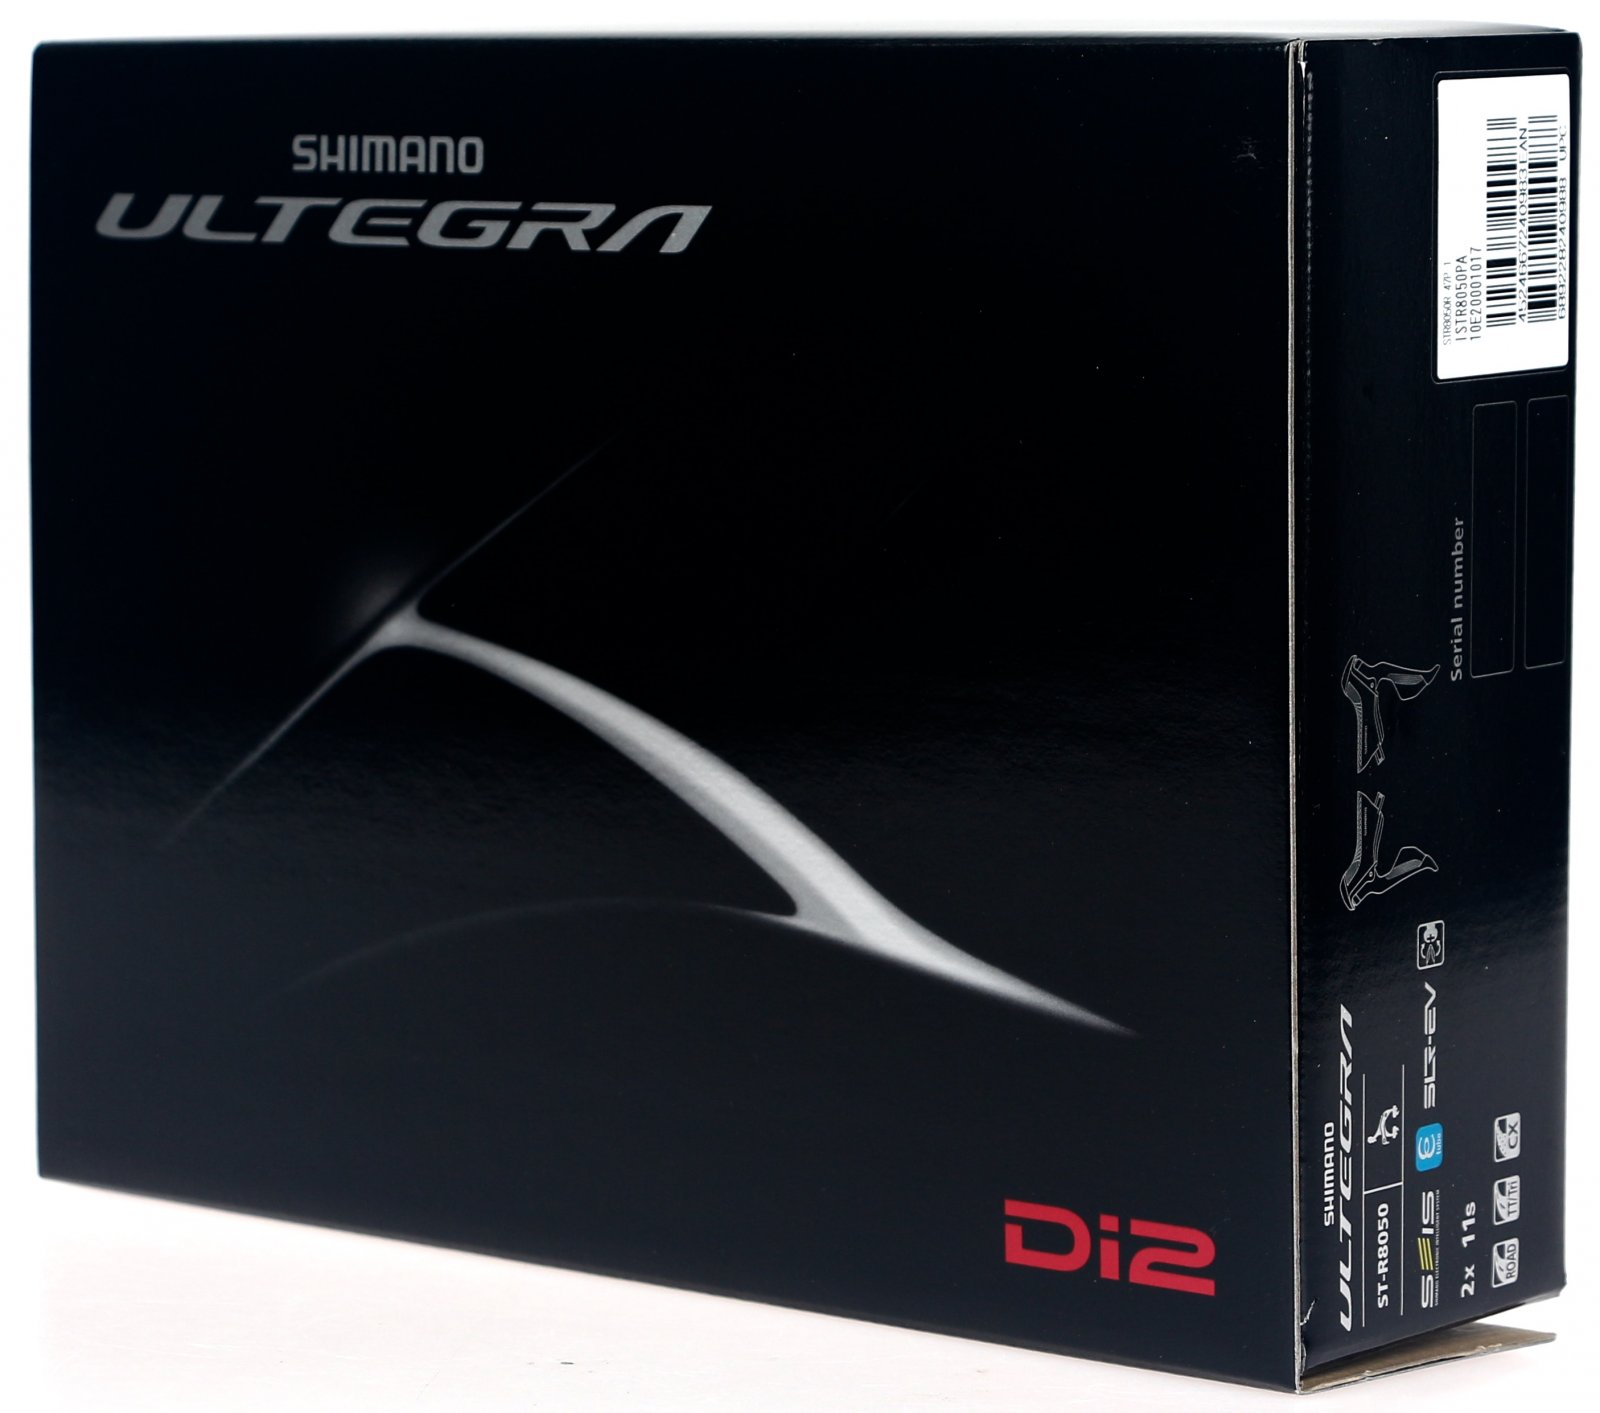 NIB SHIMANO ULTEGRA DI2 ST-R8050 2X11 SP SHIFTER//BRAKE DUAL CONTROL LEVER SET